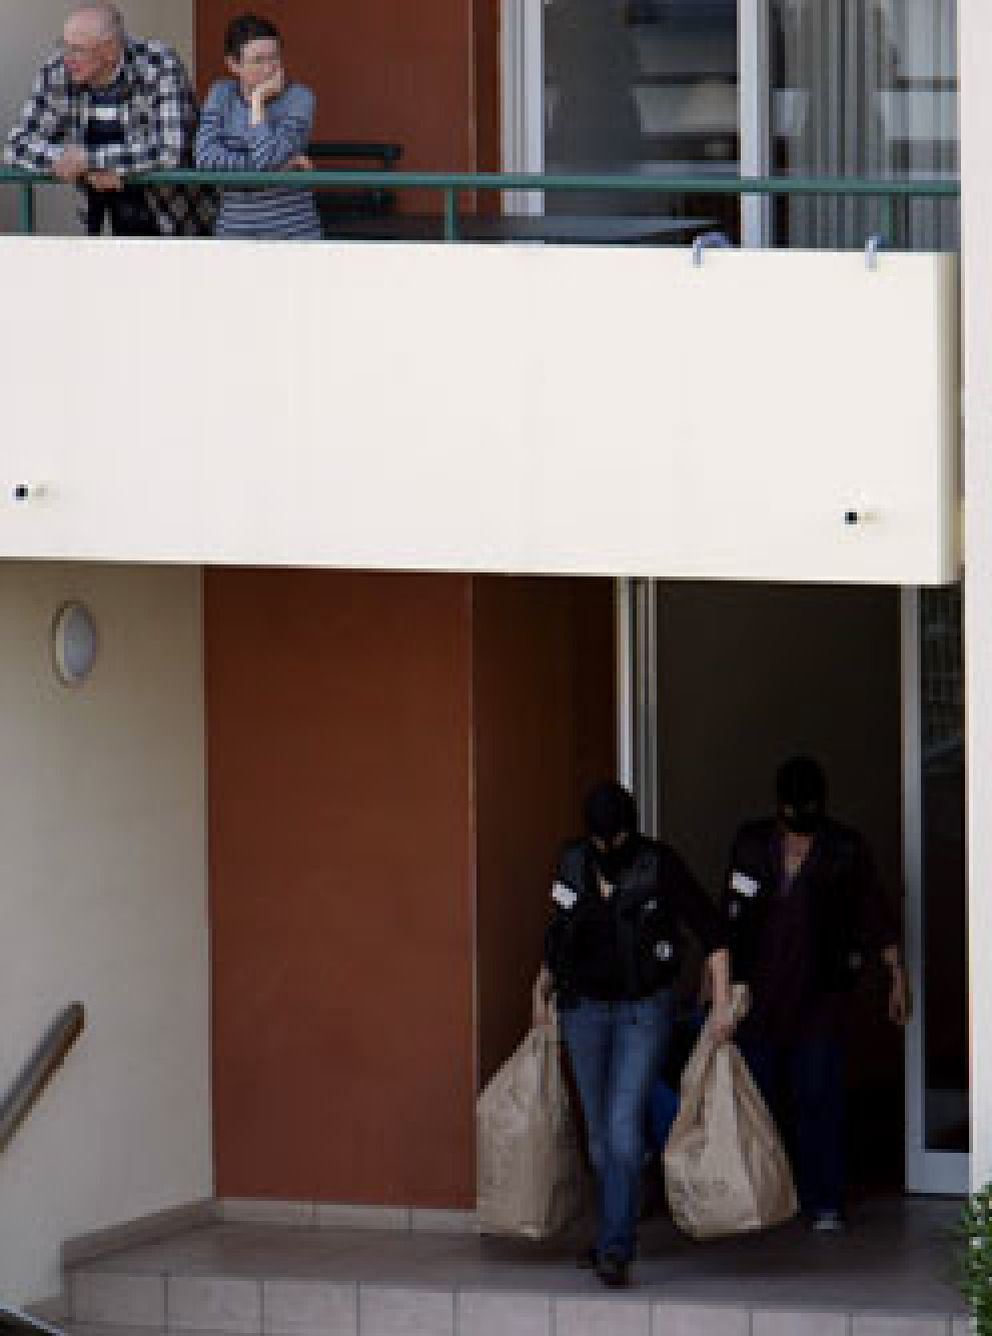 Foto: Éxito del CNI: el cerco a los pisos de acogida llevó a la detención del jefe de ETA